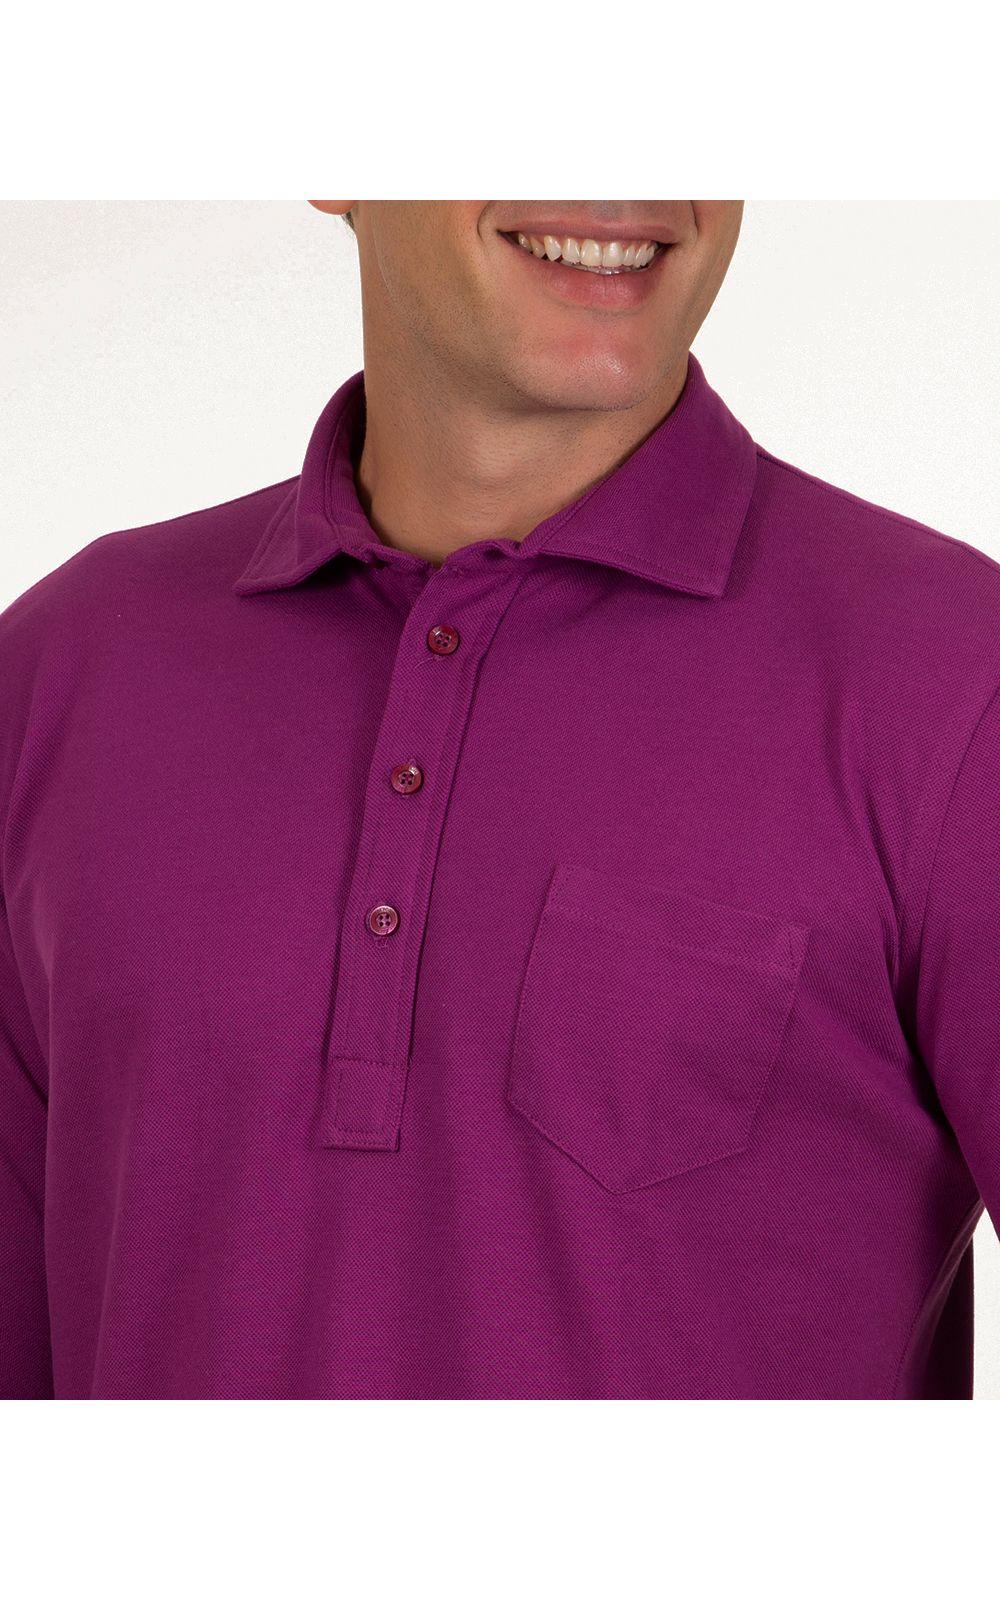 Foto 3 - Camisa Polo Masculina Roxo Lisa